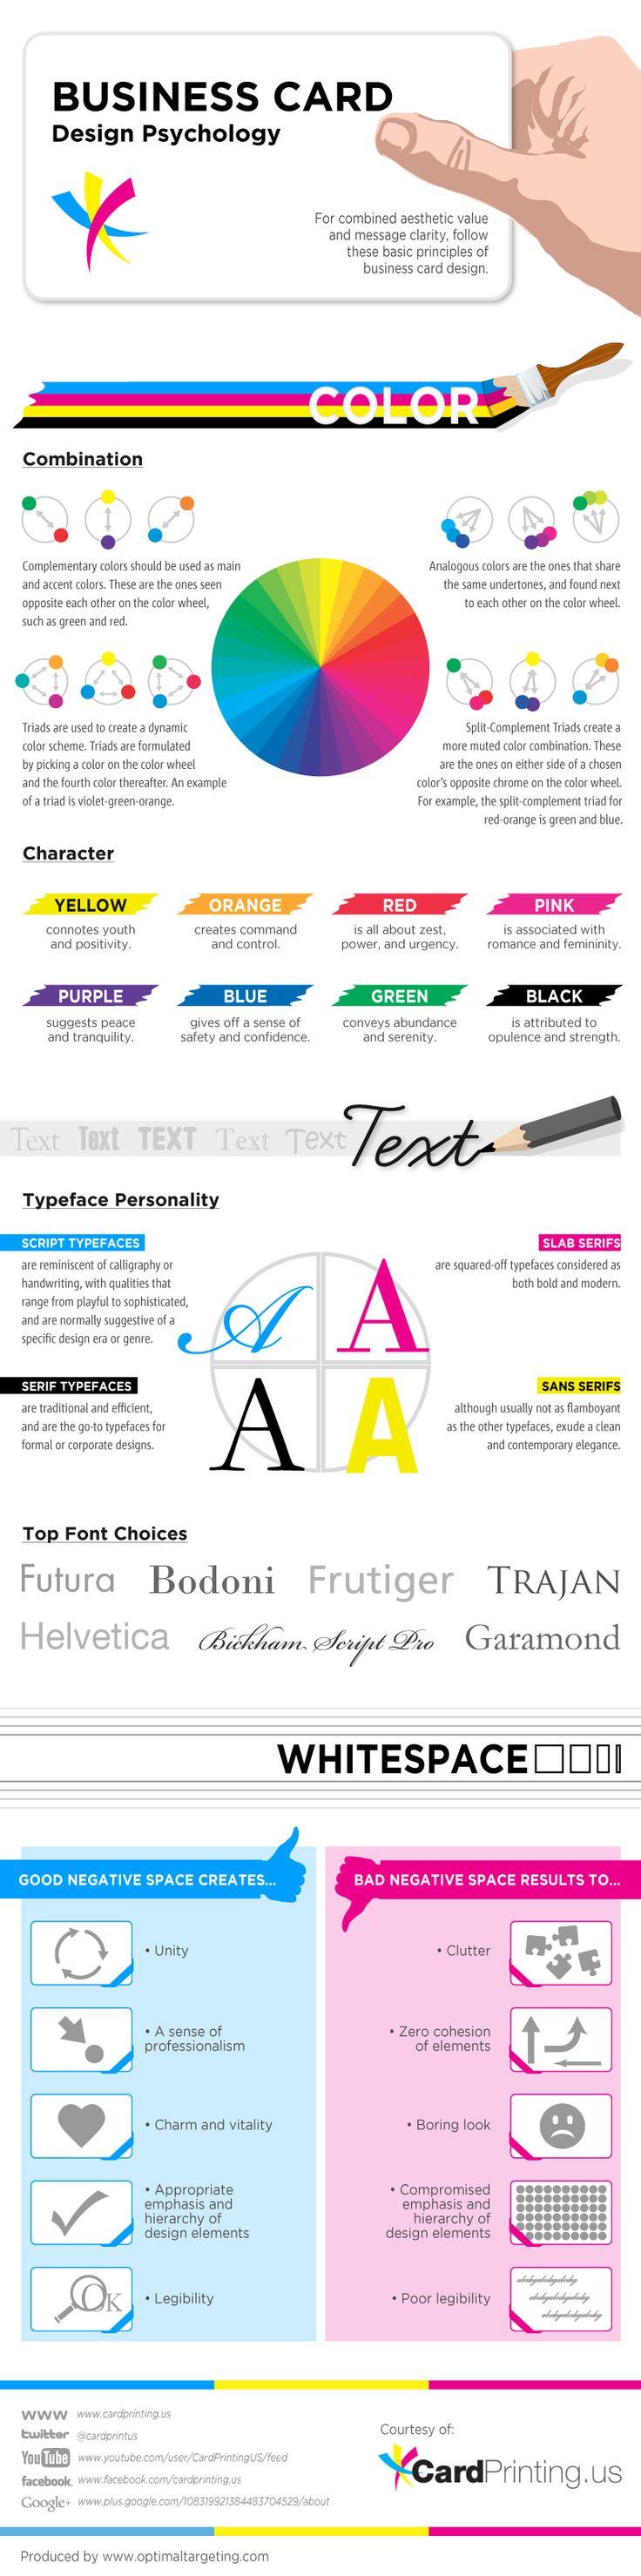 Business Card Design Psychology | CardPrinting.us Blog